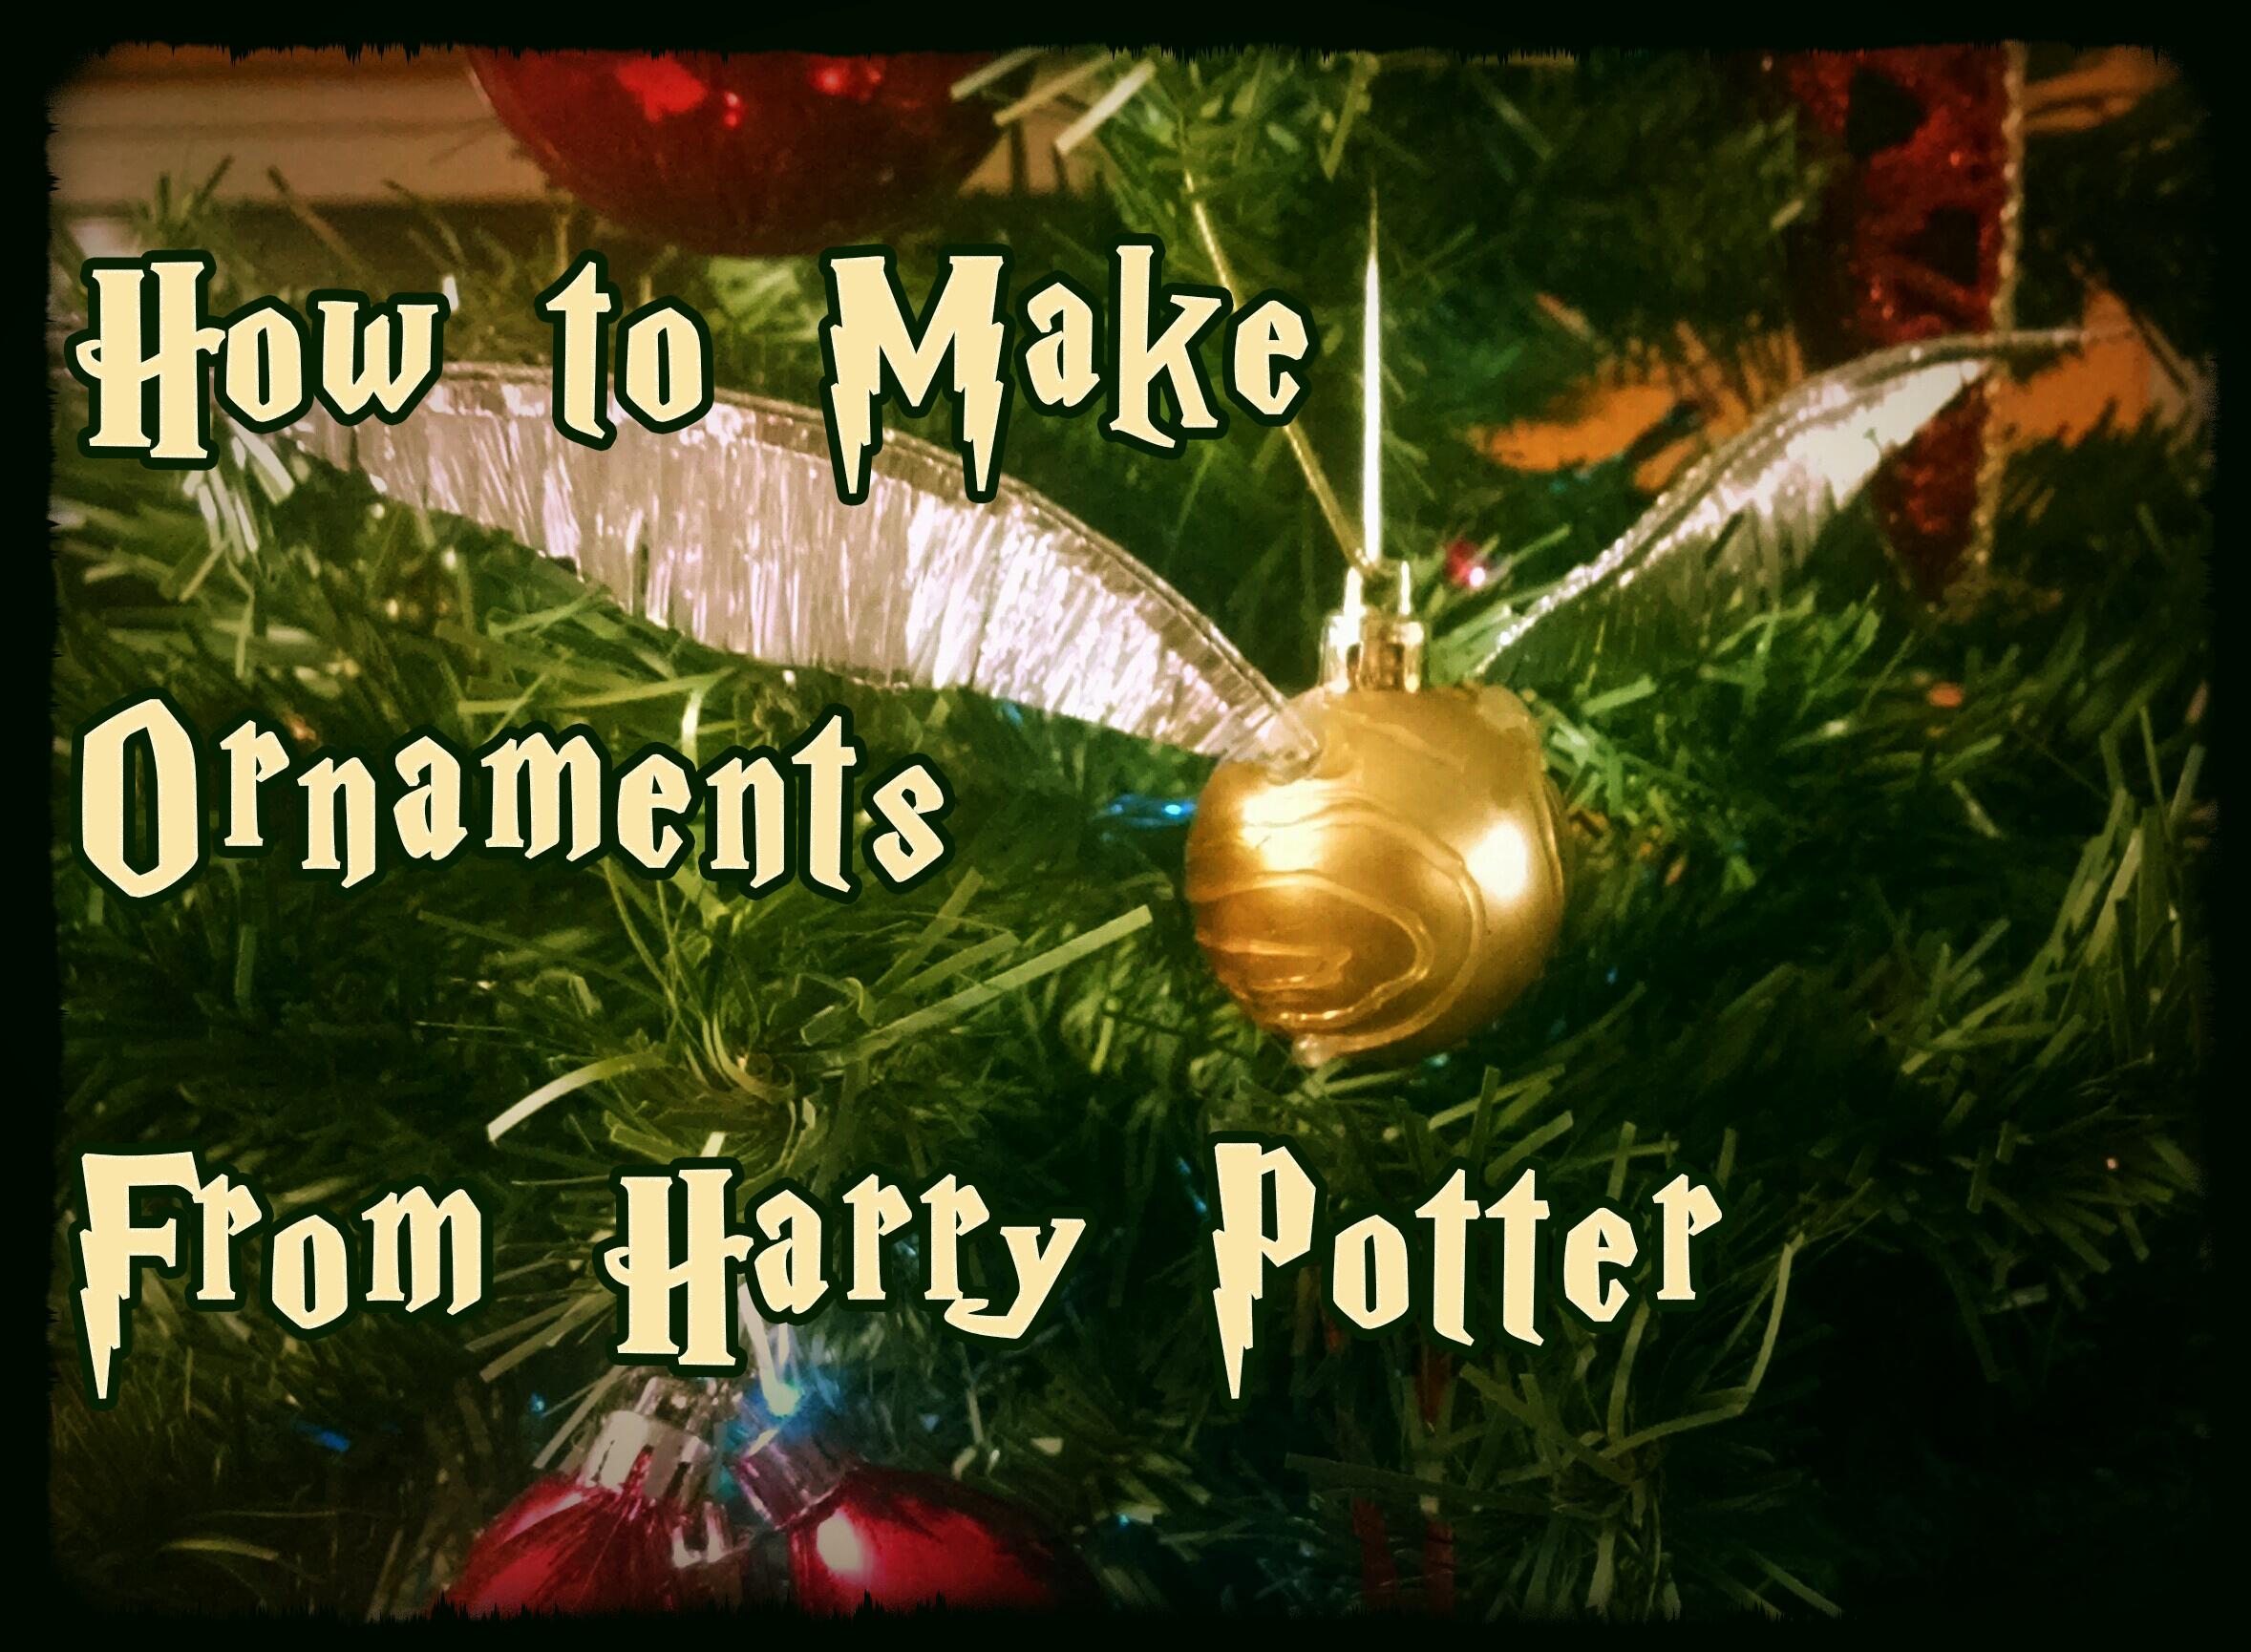 Harry potter christmas ornament - Harry Potter Christmas Ornament 52